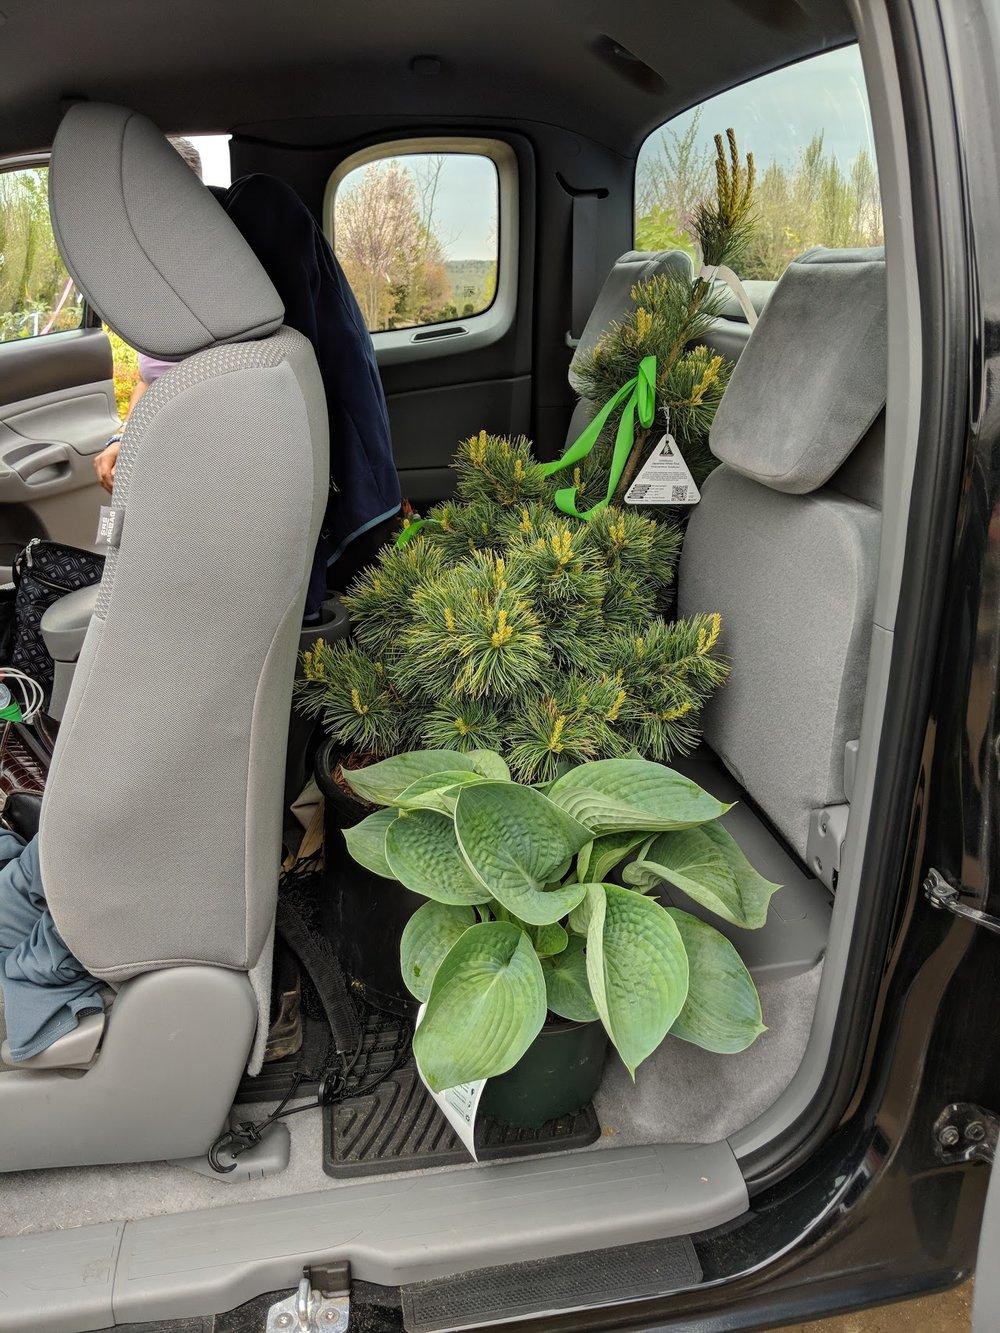 Back-seat stowaways